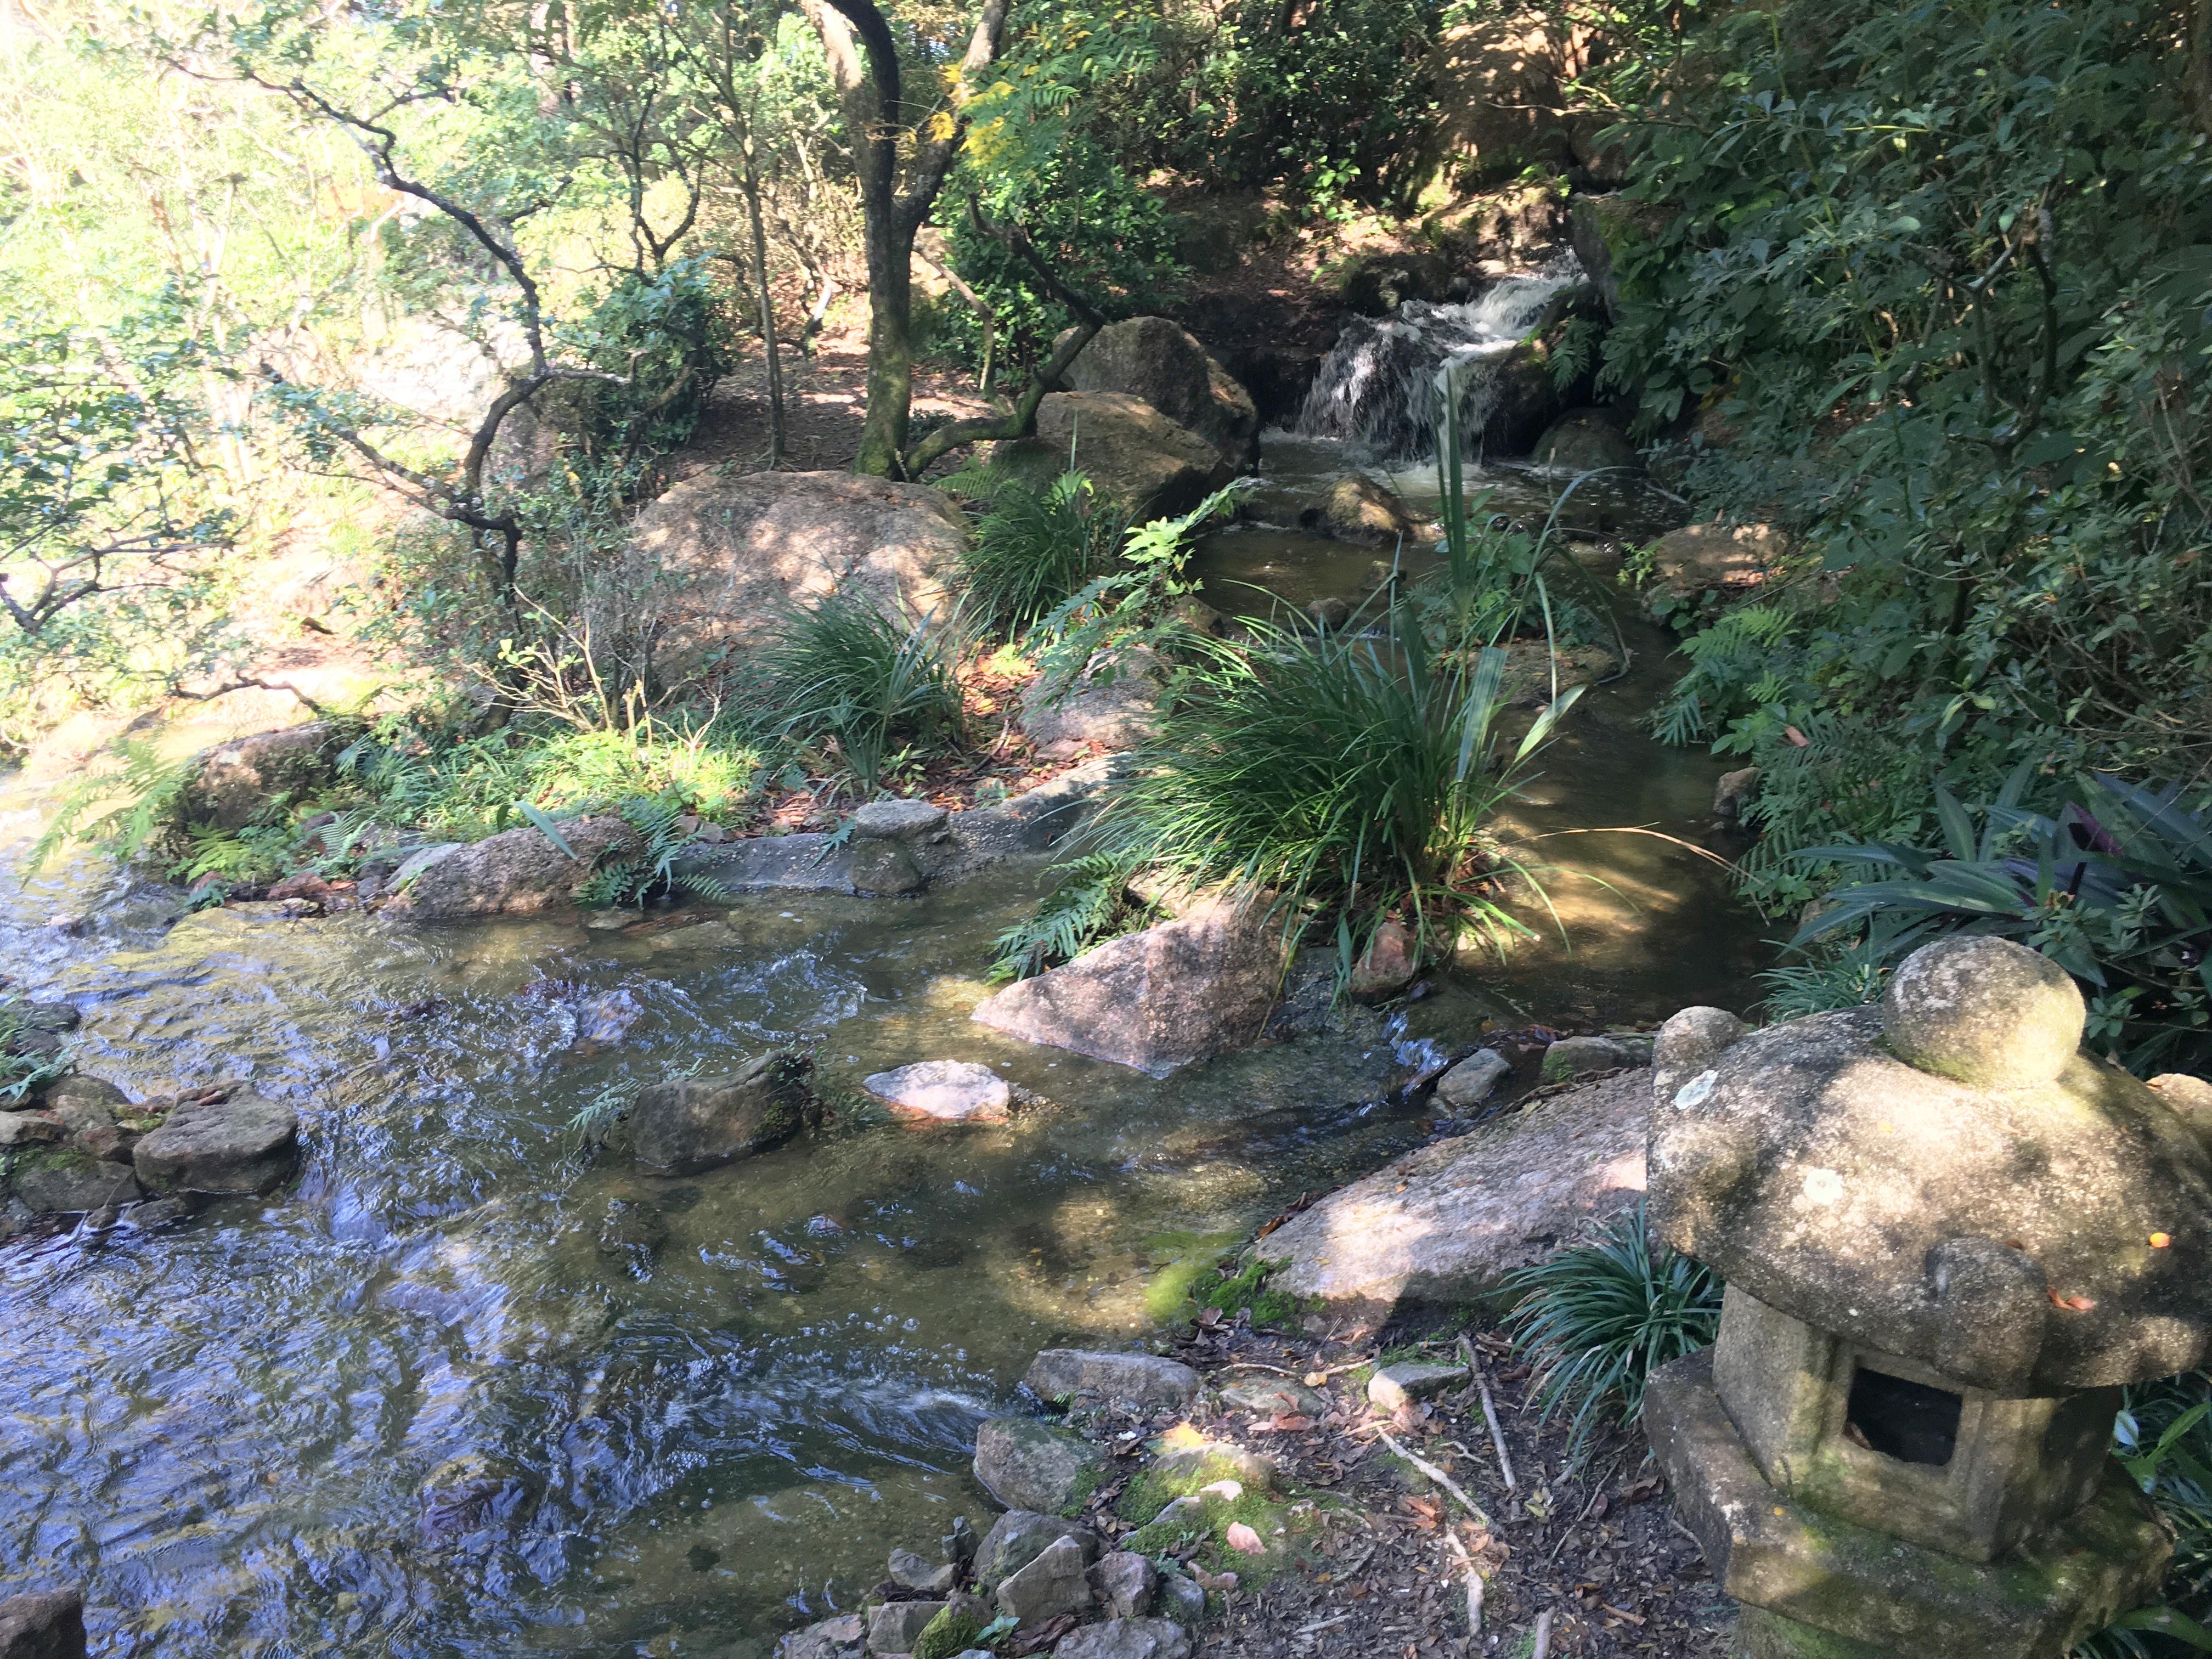 Morikami museum japanese garden, palm beach florida